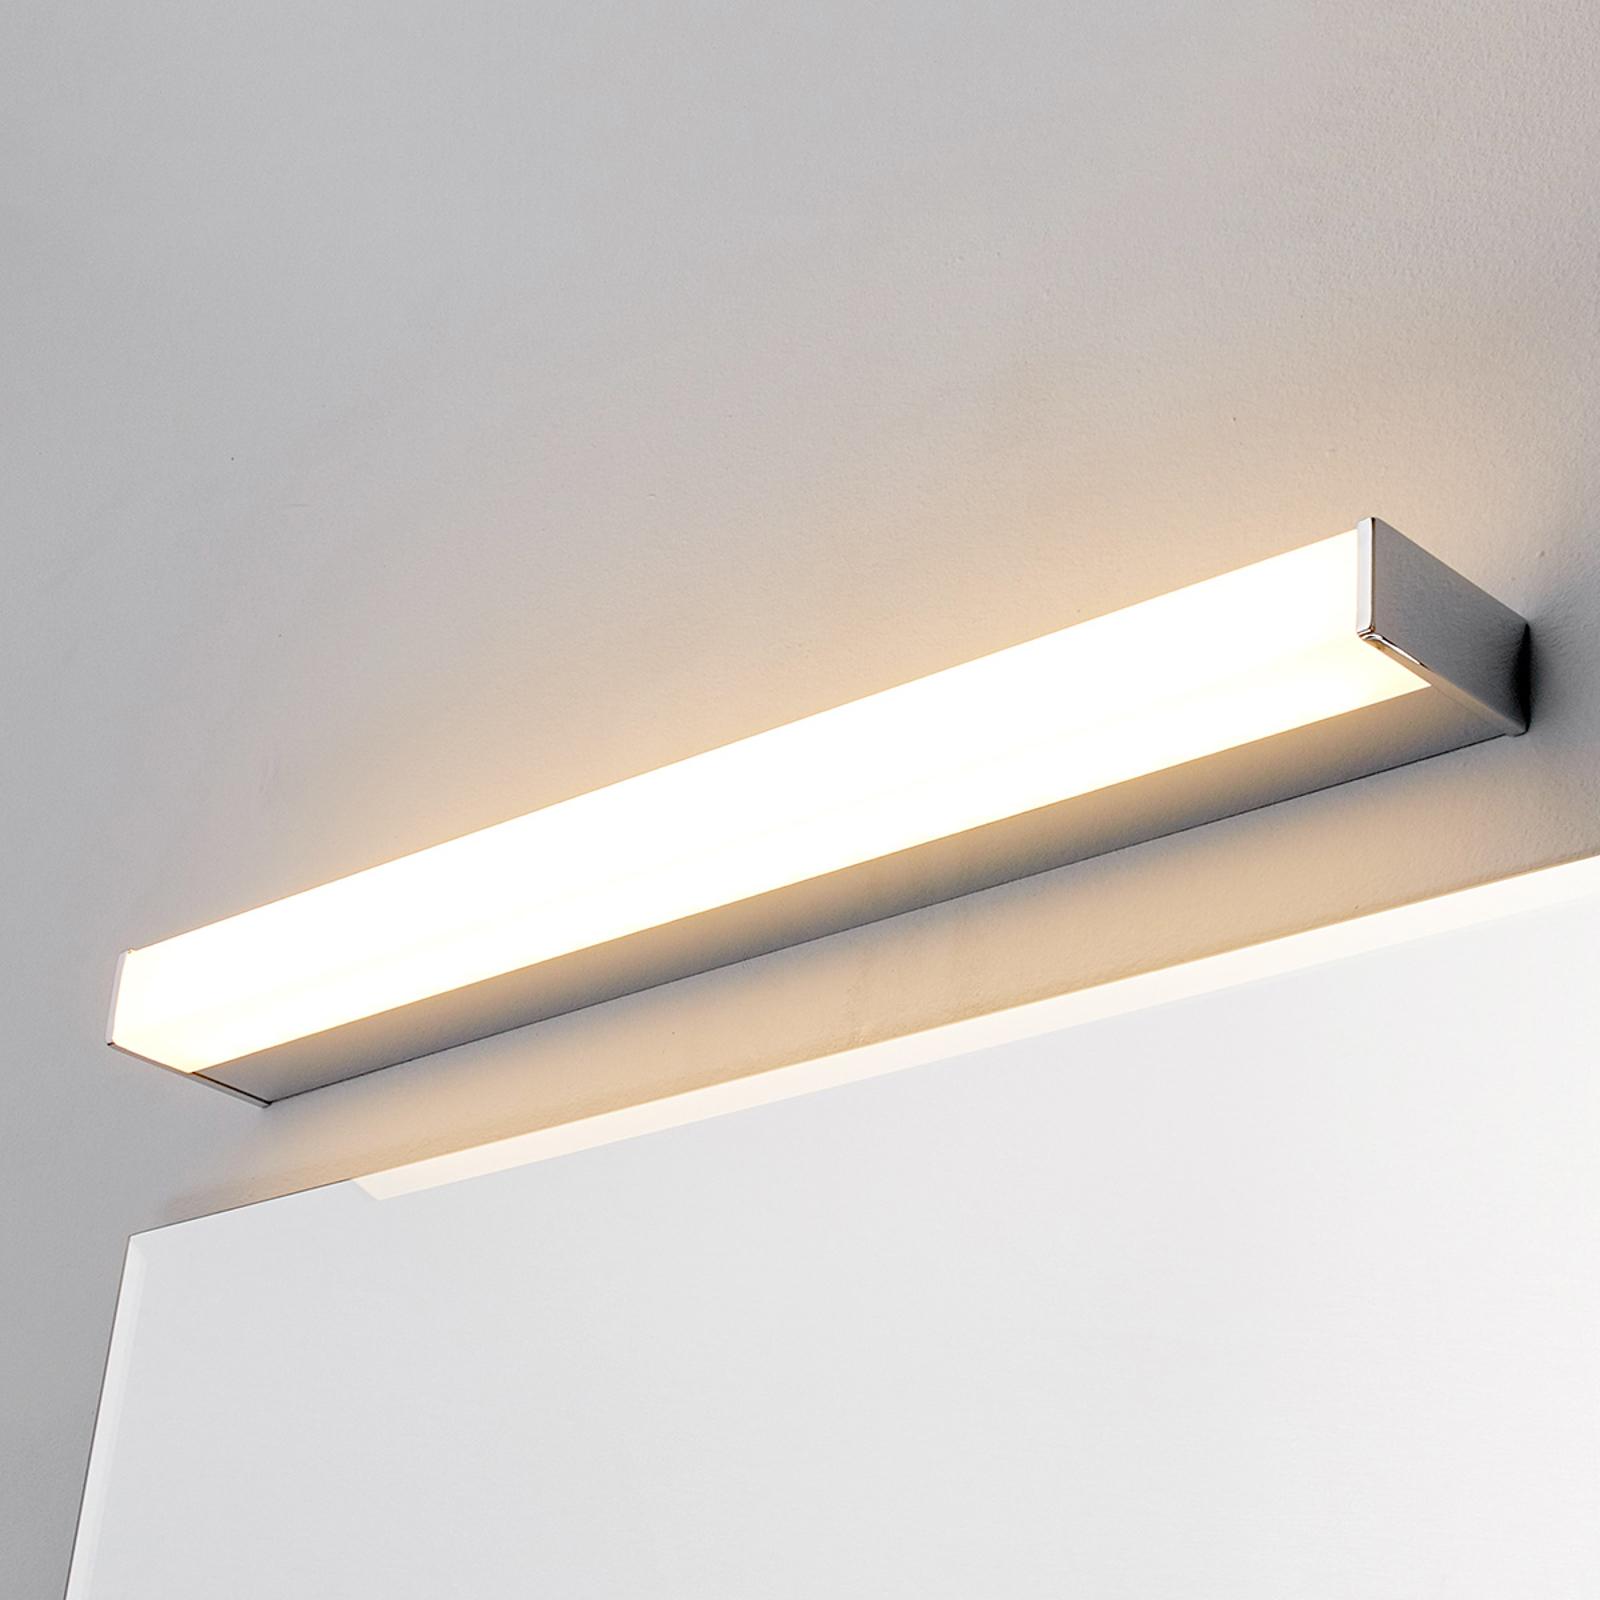 Applique miroir bain LED Philippa angulaire 58,8cm